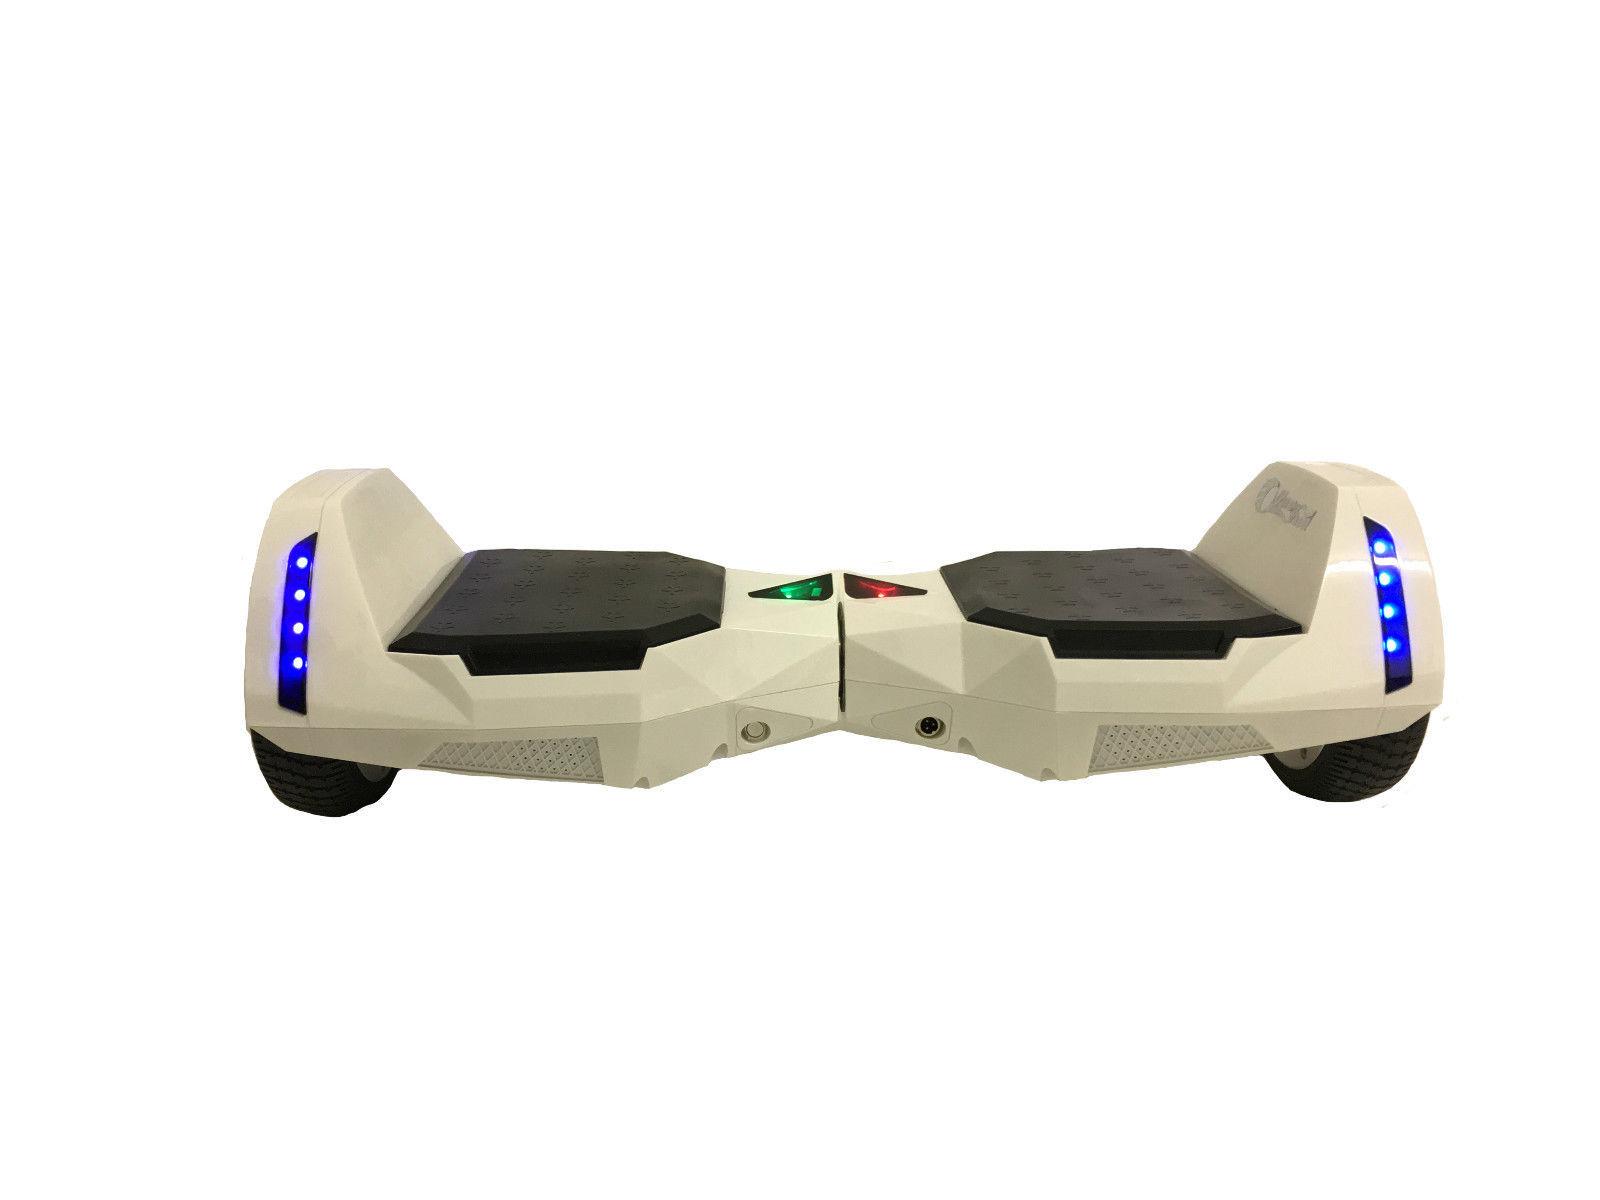 "MR6 Bluetooth Batman White Hoverboard 6.5"" - UL2272 certified"